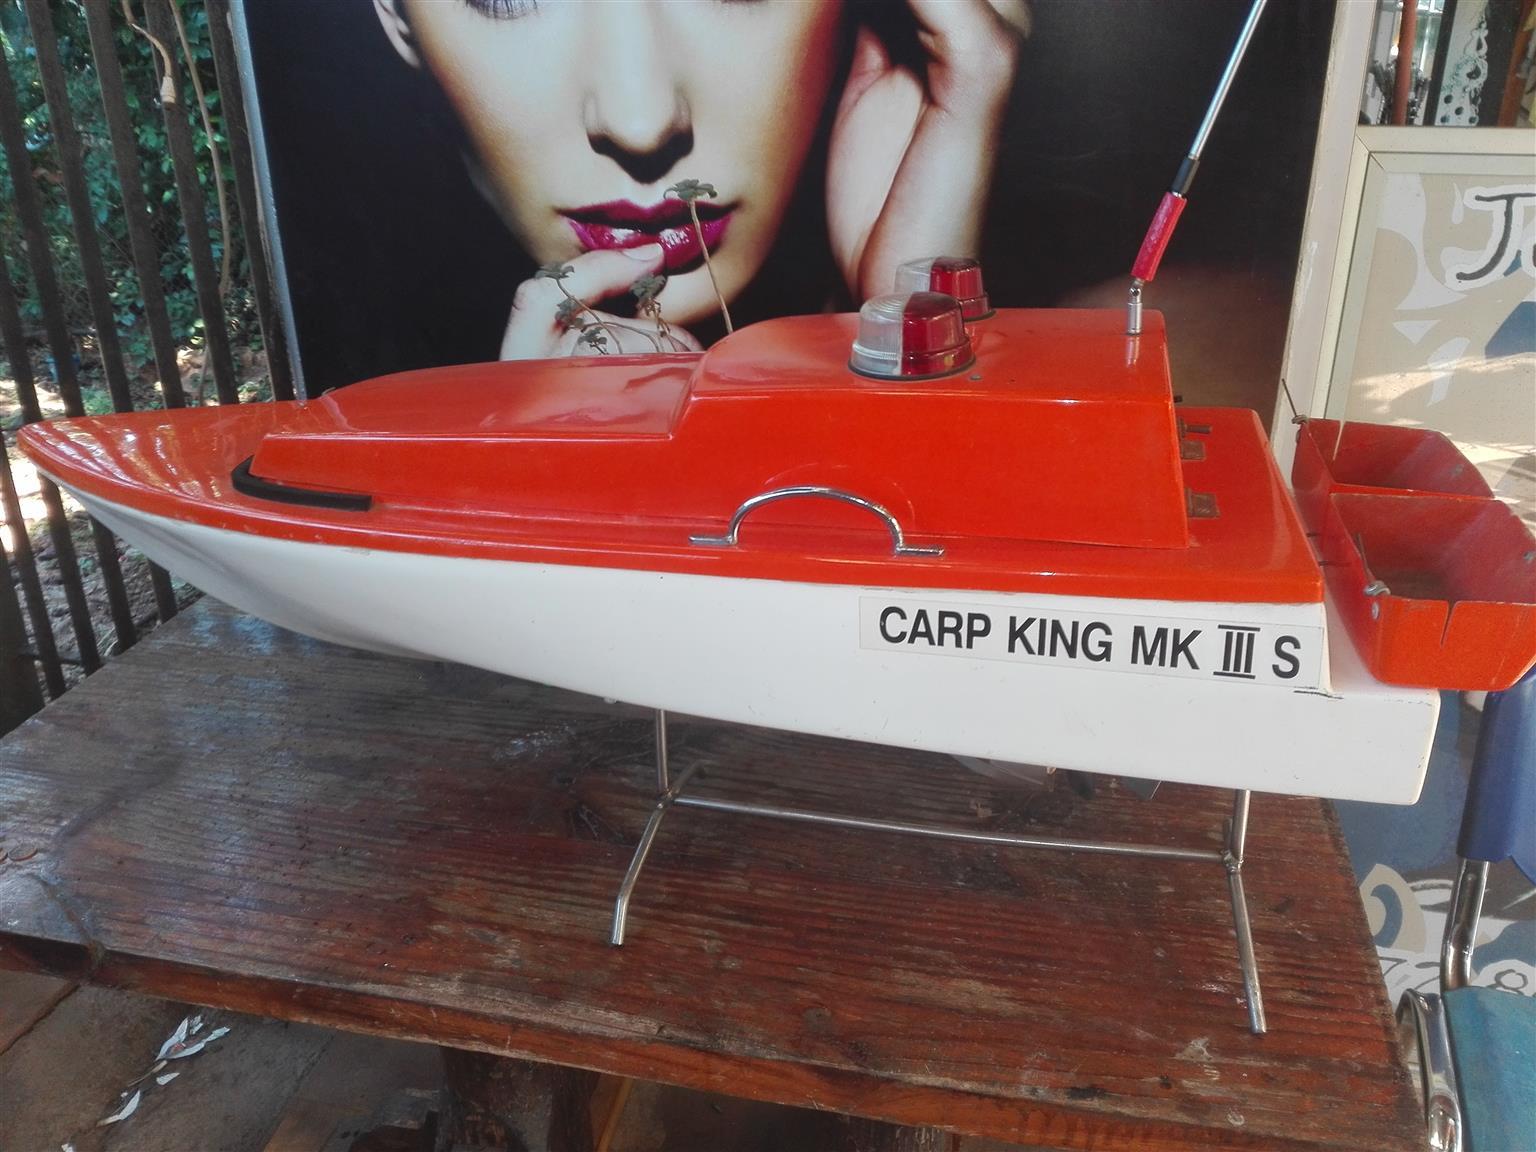 Carp king mk3